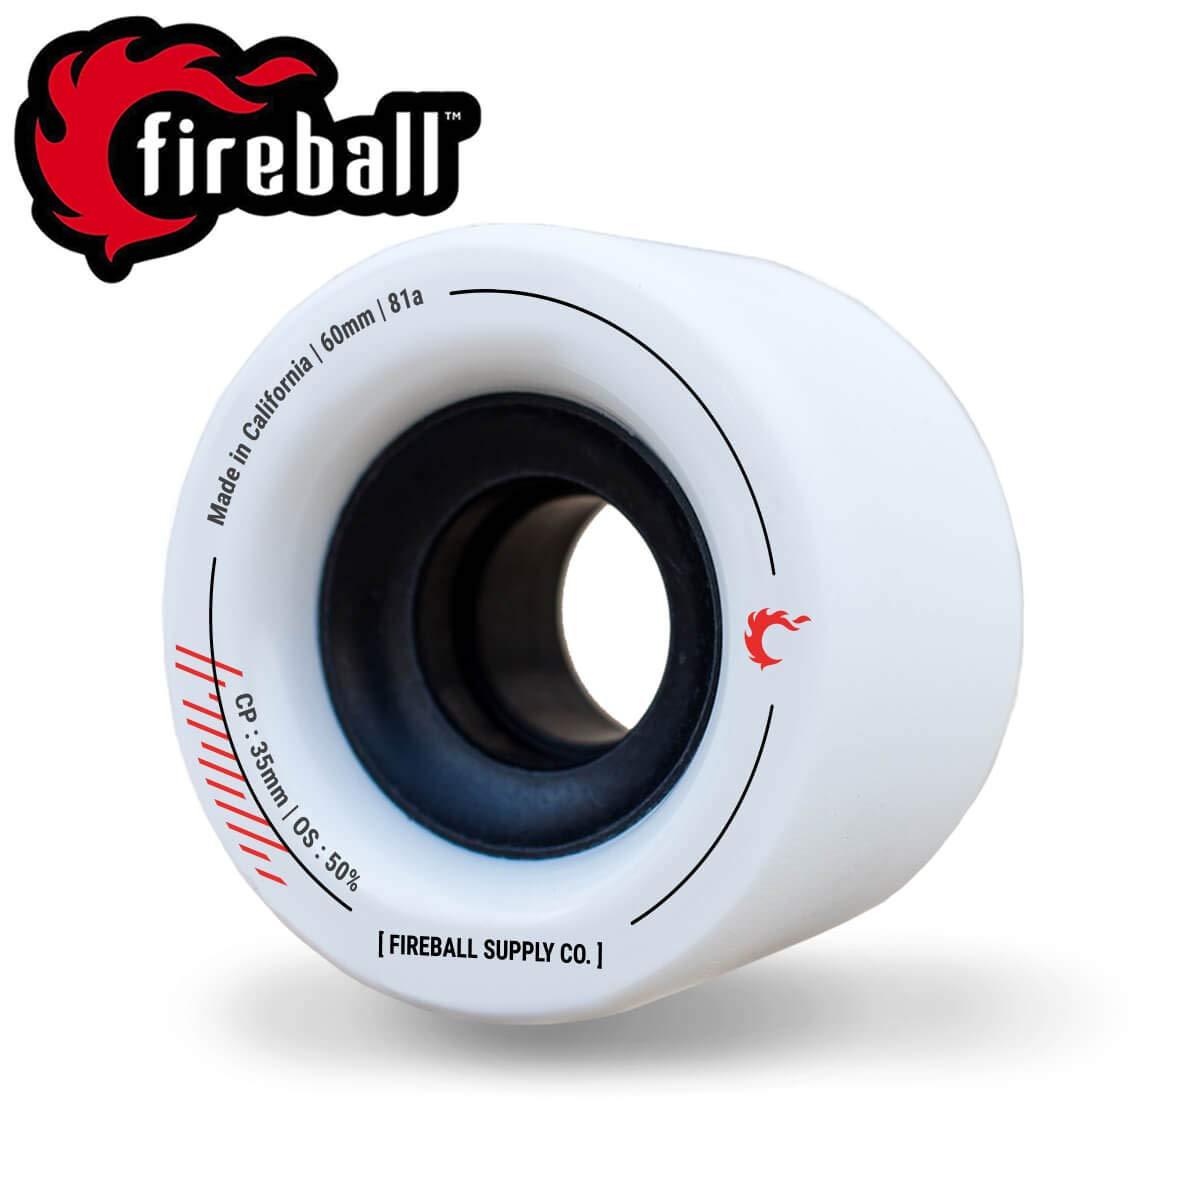 Fireball Tinder 81a 60mm 70mm Skateboard & Longboard Wheels   Set of 4 for Smooth Cruising, Sliding, Dance & Freeride